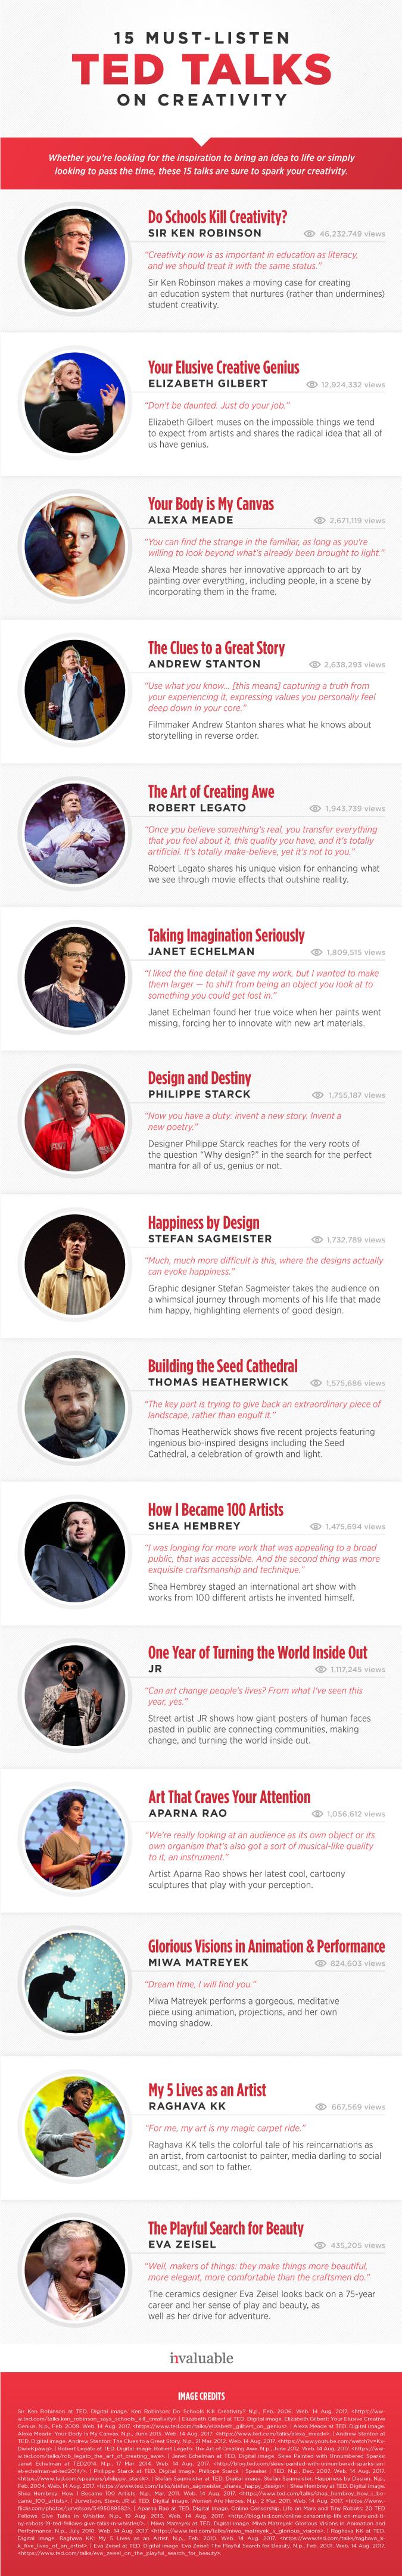 Creativity - Ted Talks